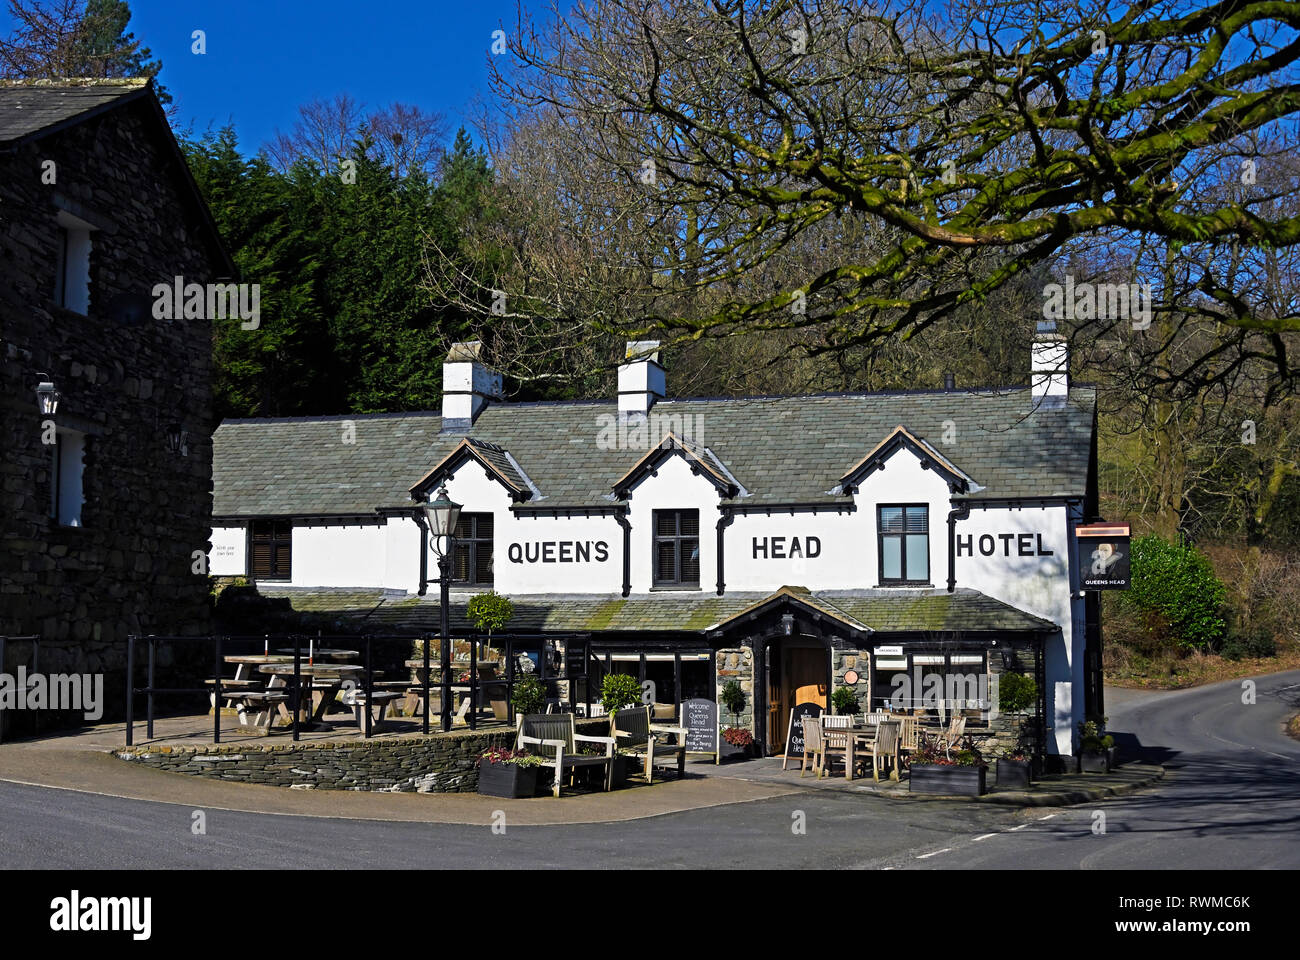 Queen's Head Hotel. Troutbeck, Windermere, Lake District National Park, Cumbria, Inglaterra, Reino Unido, Europa. Imagen De Stock